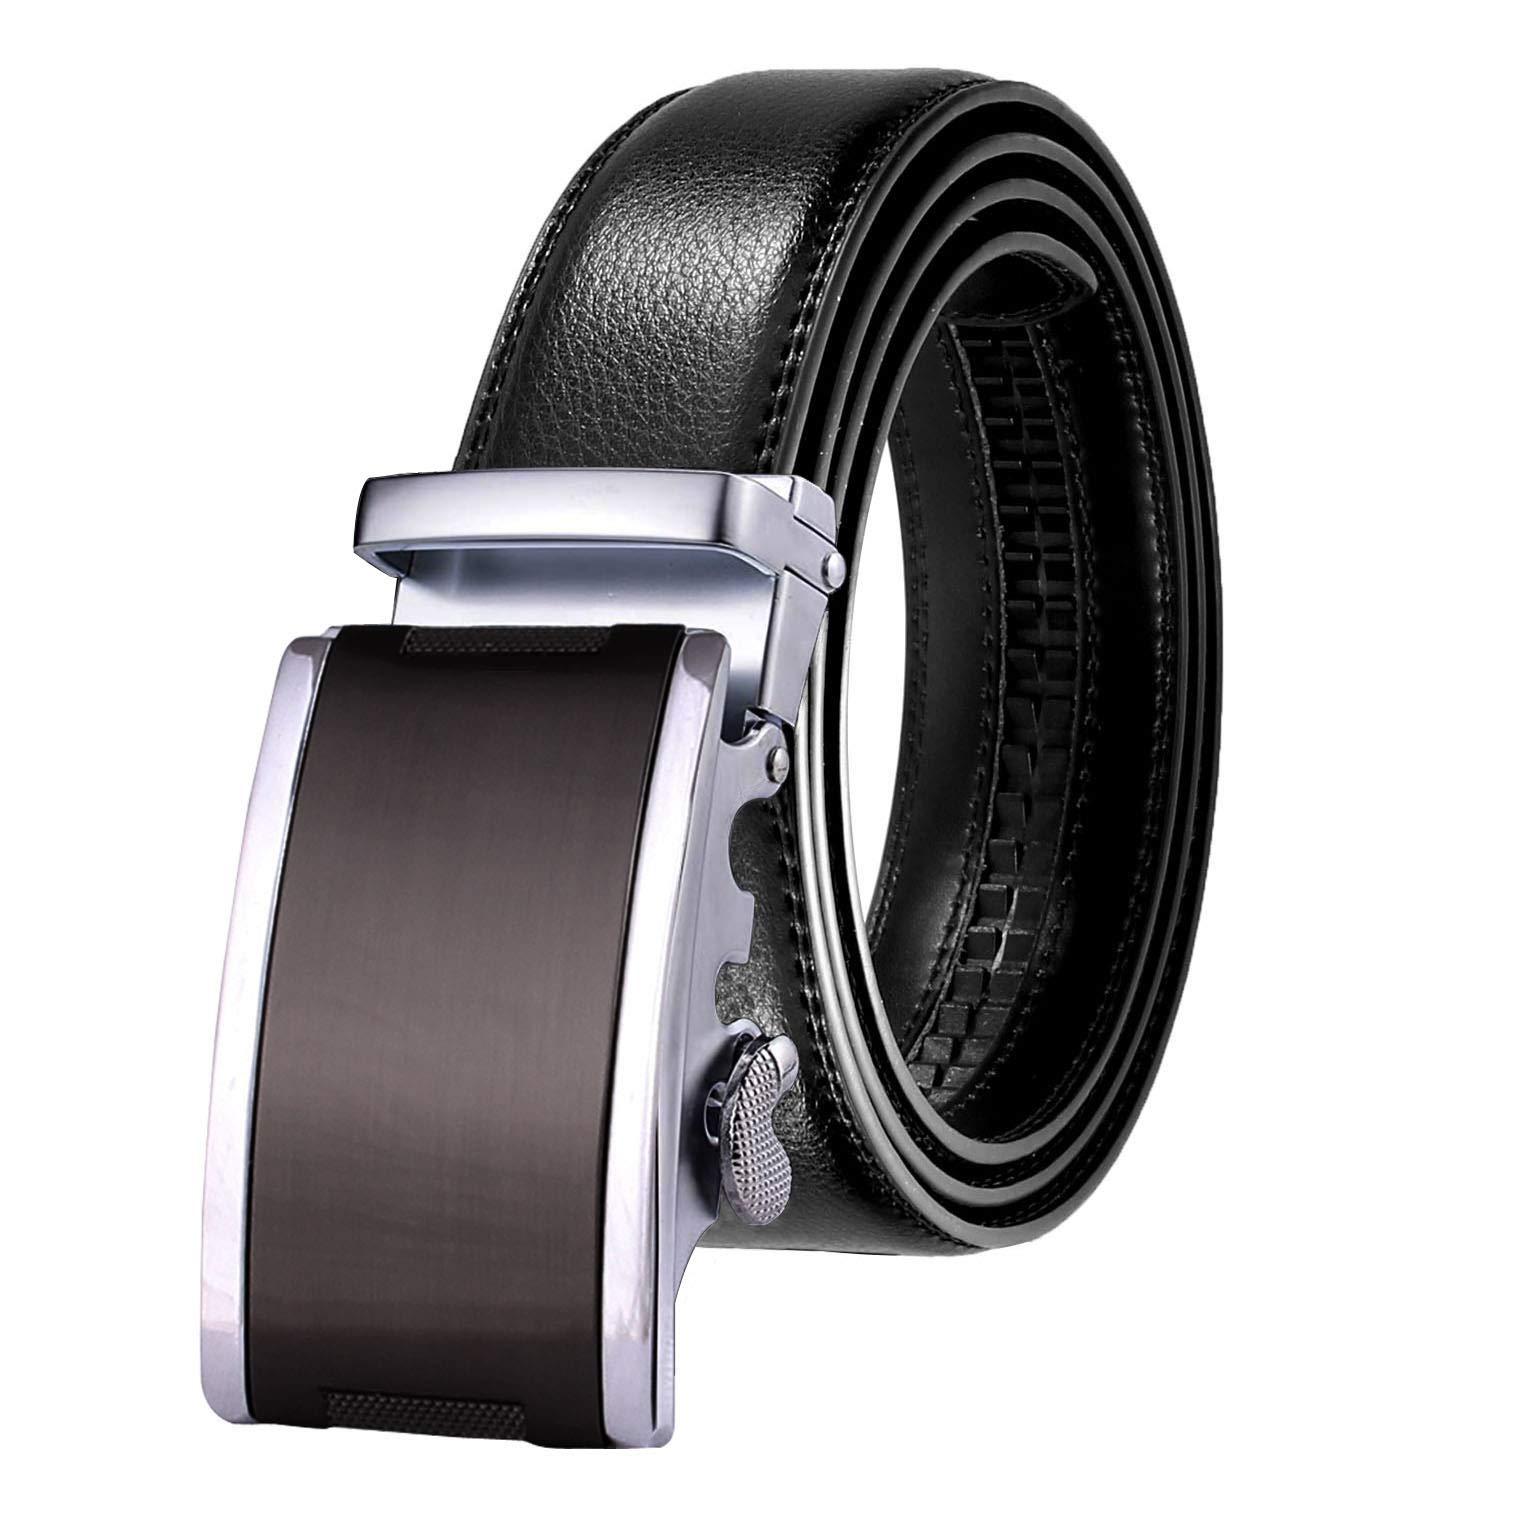 JINIU Leather Automatic Buckle Ratchet